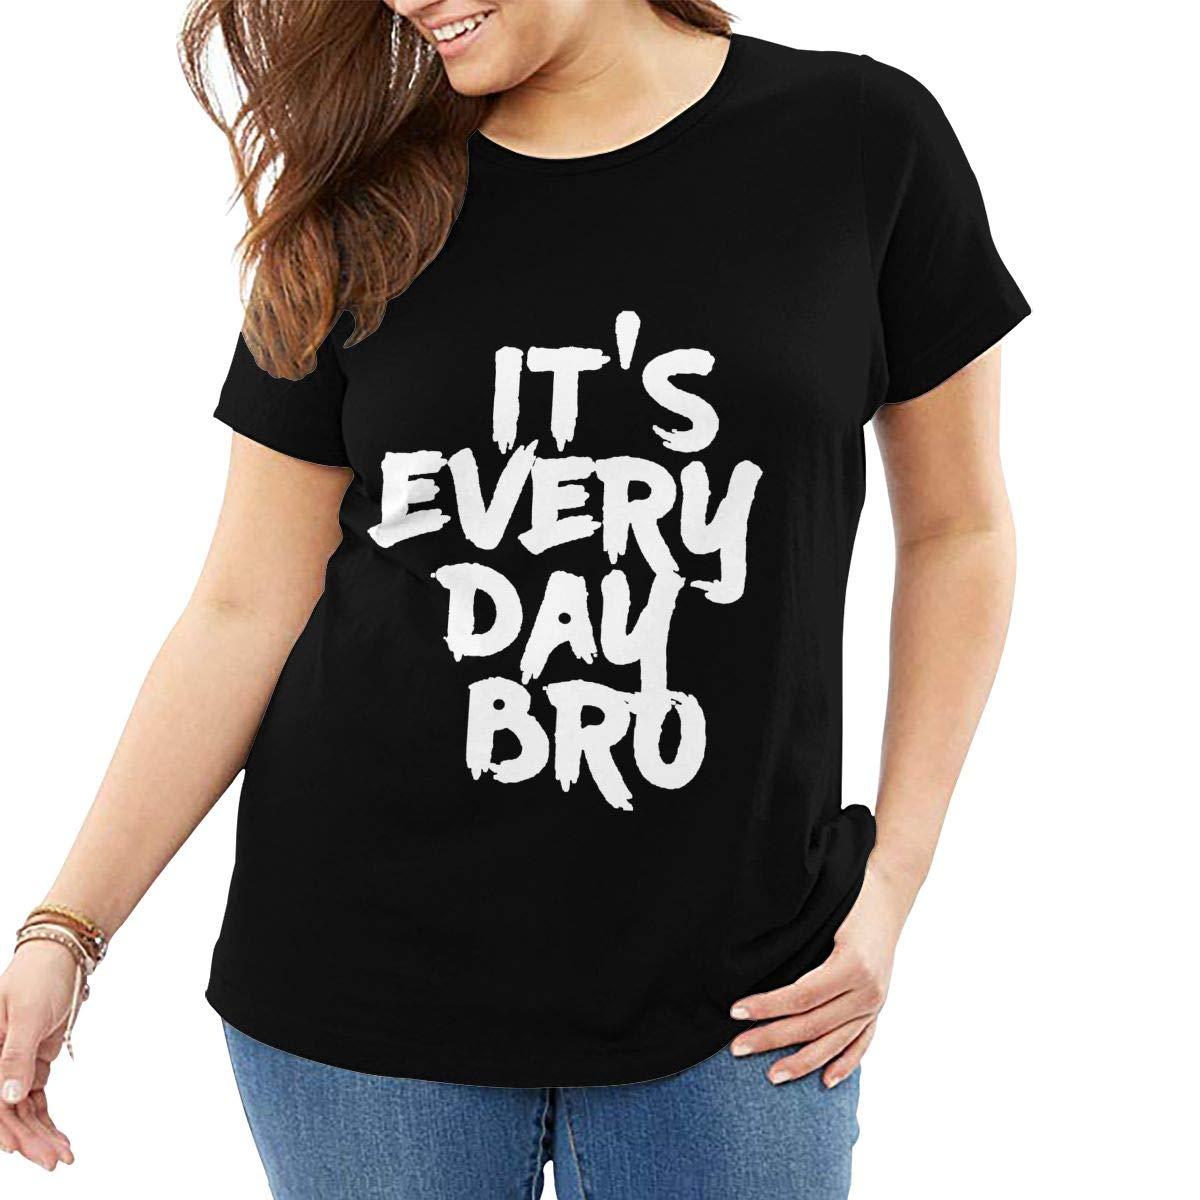 Fat Women's T Shirt Jake Paul It's Every Day BRO Tee Shirts T-Shirt Short-Sleeve Round Neck Tshirt for Women Girls Black 6XL by BKashy